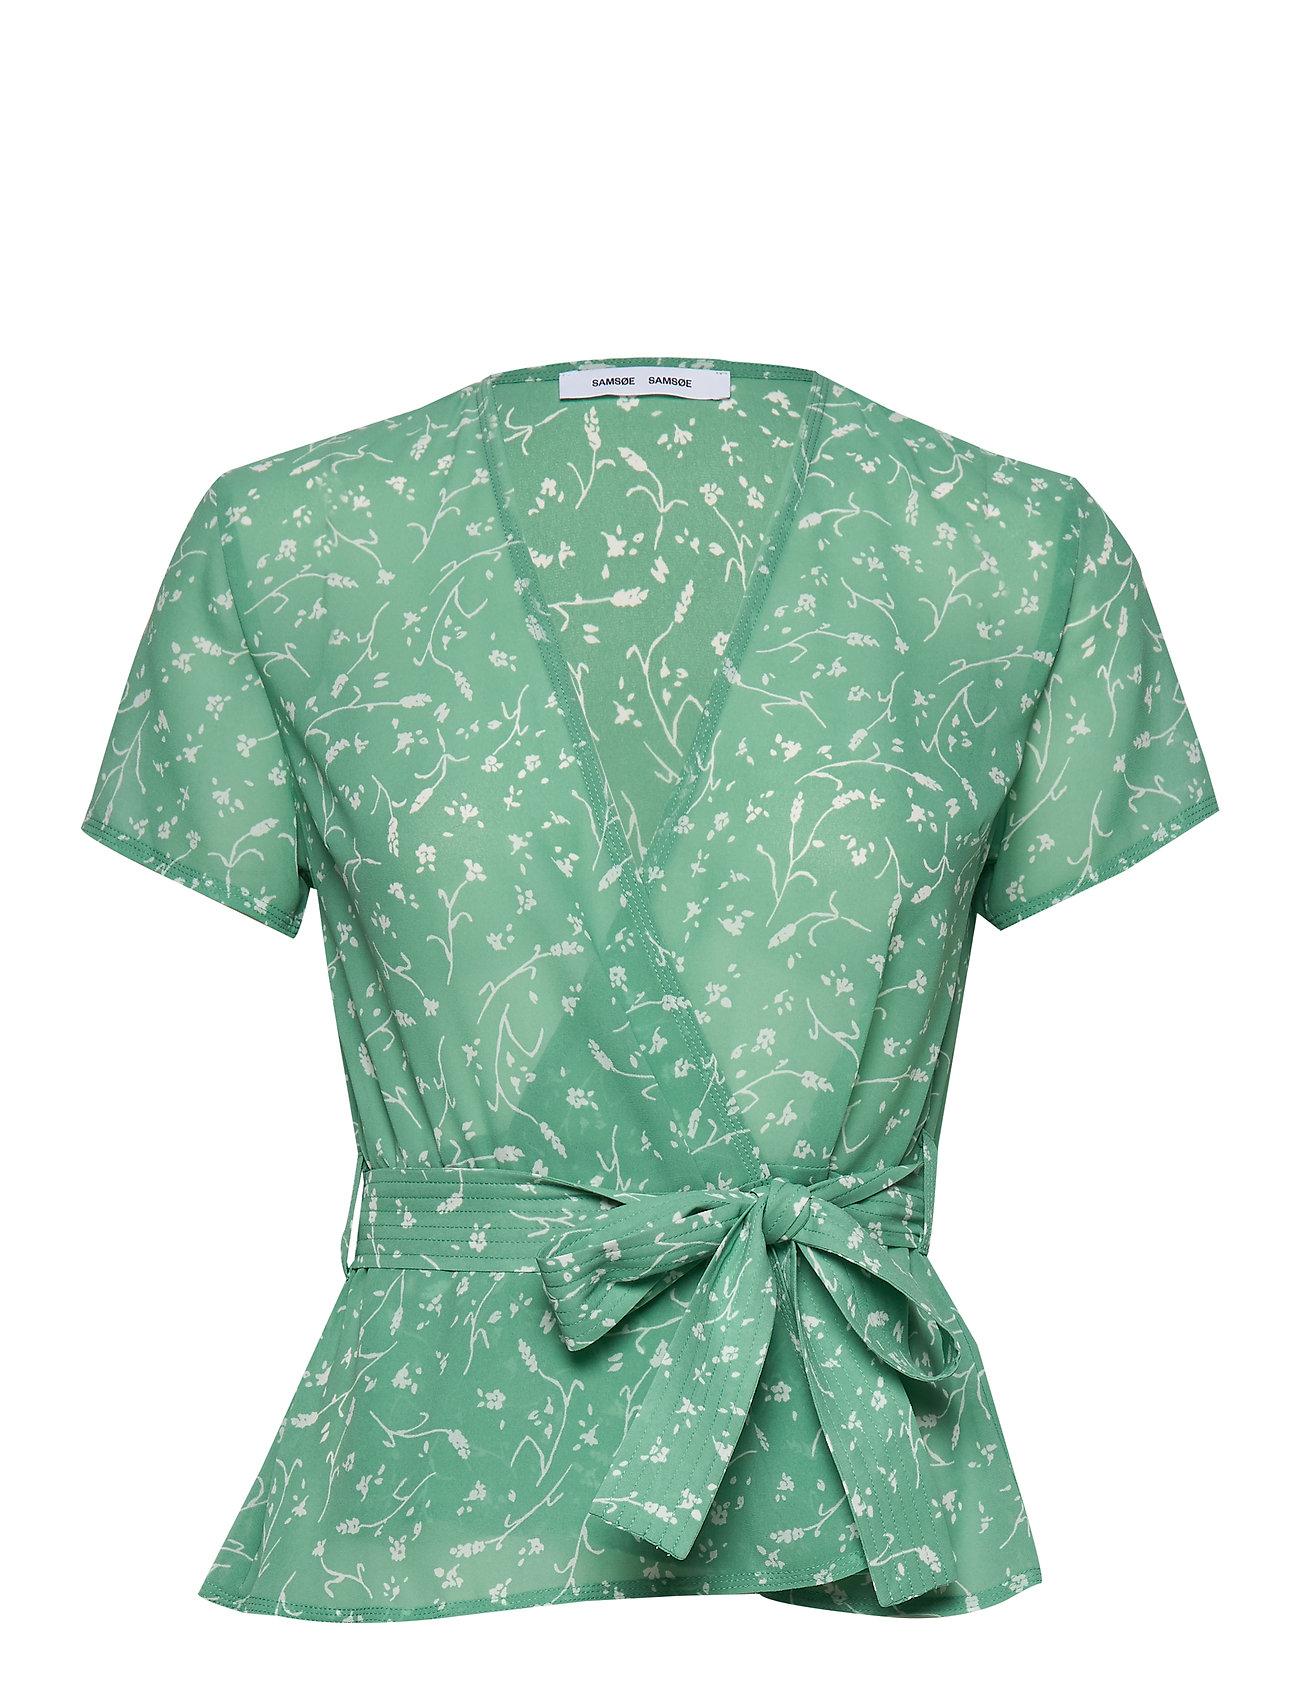 Samsøe Samsøe Klea ss blouse aop 6621 - FEUILLES MENTHE